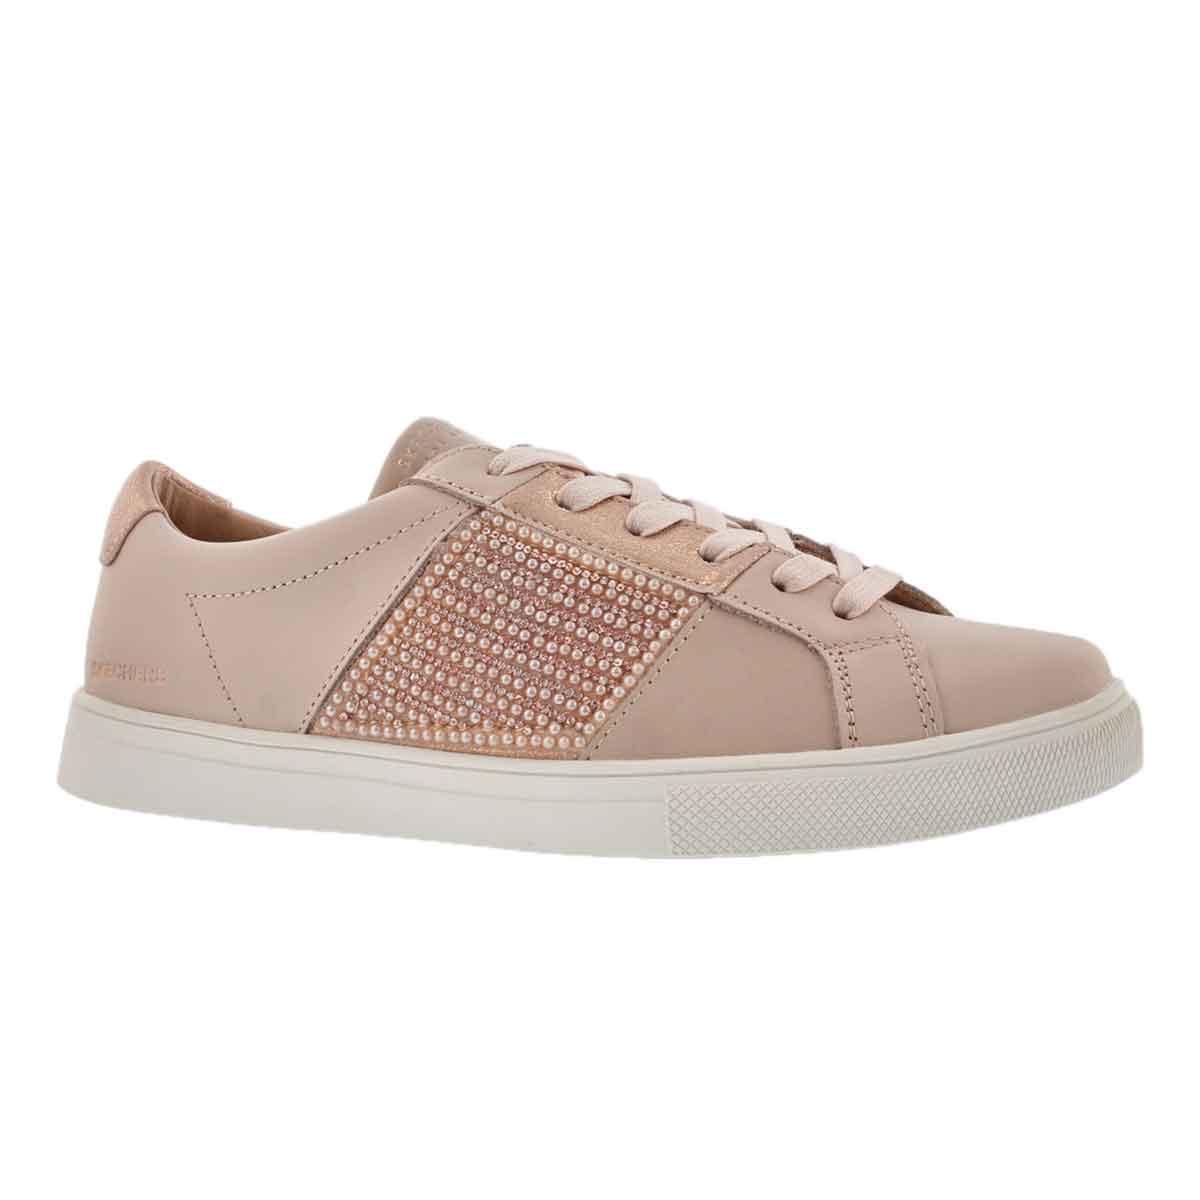 Women's MODA BLING BANDIT light pink sneakers